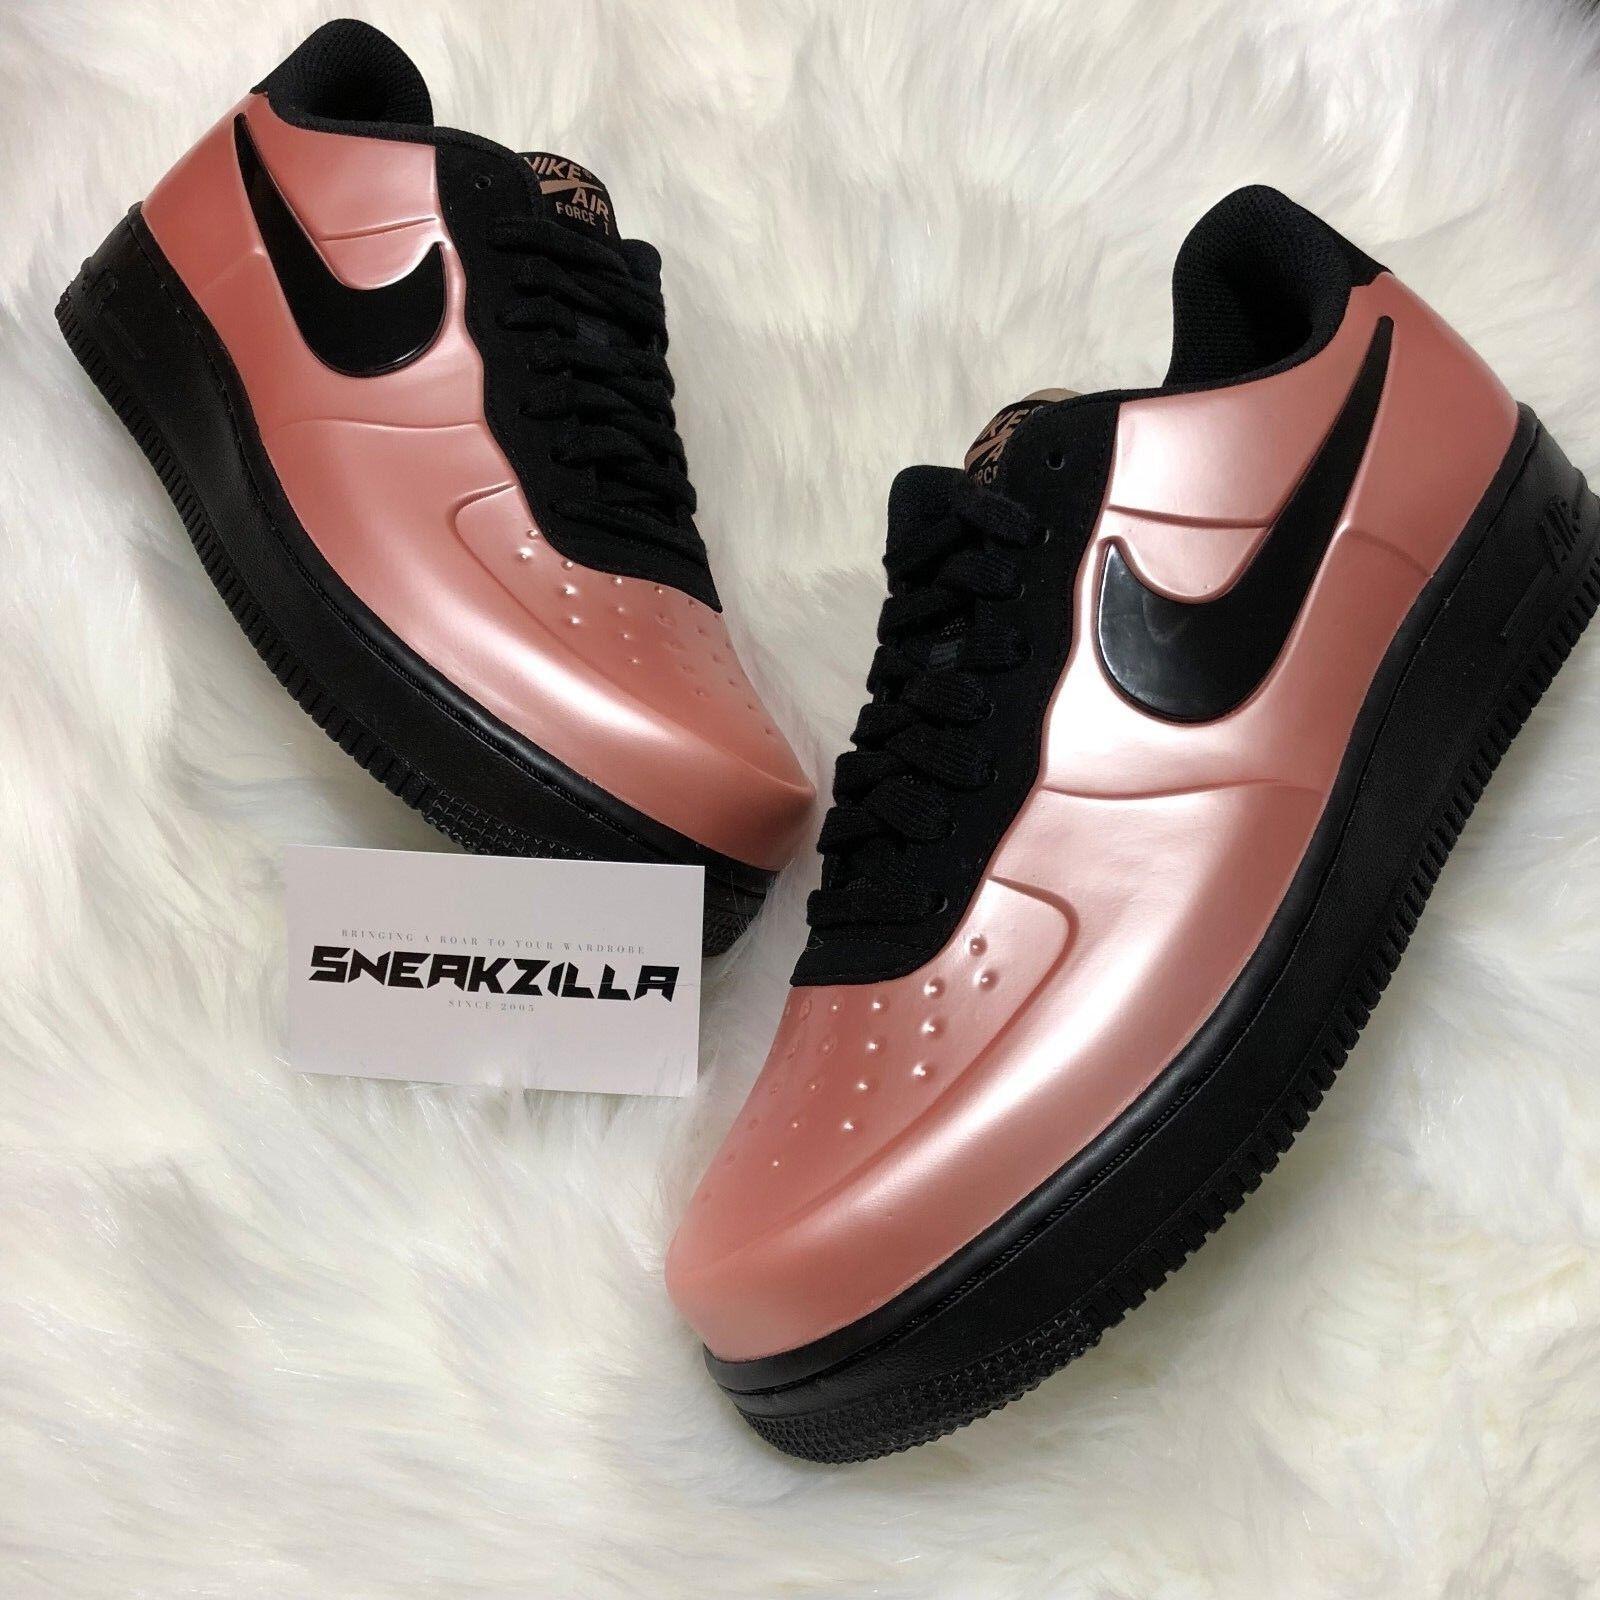 Nike air force one 1 foamposite tazza unico corallo stardust af1 aj3664-600 cupsole